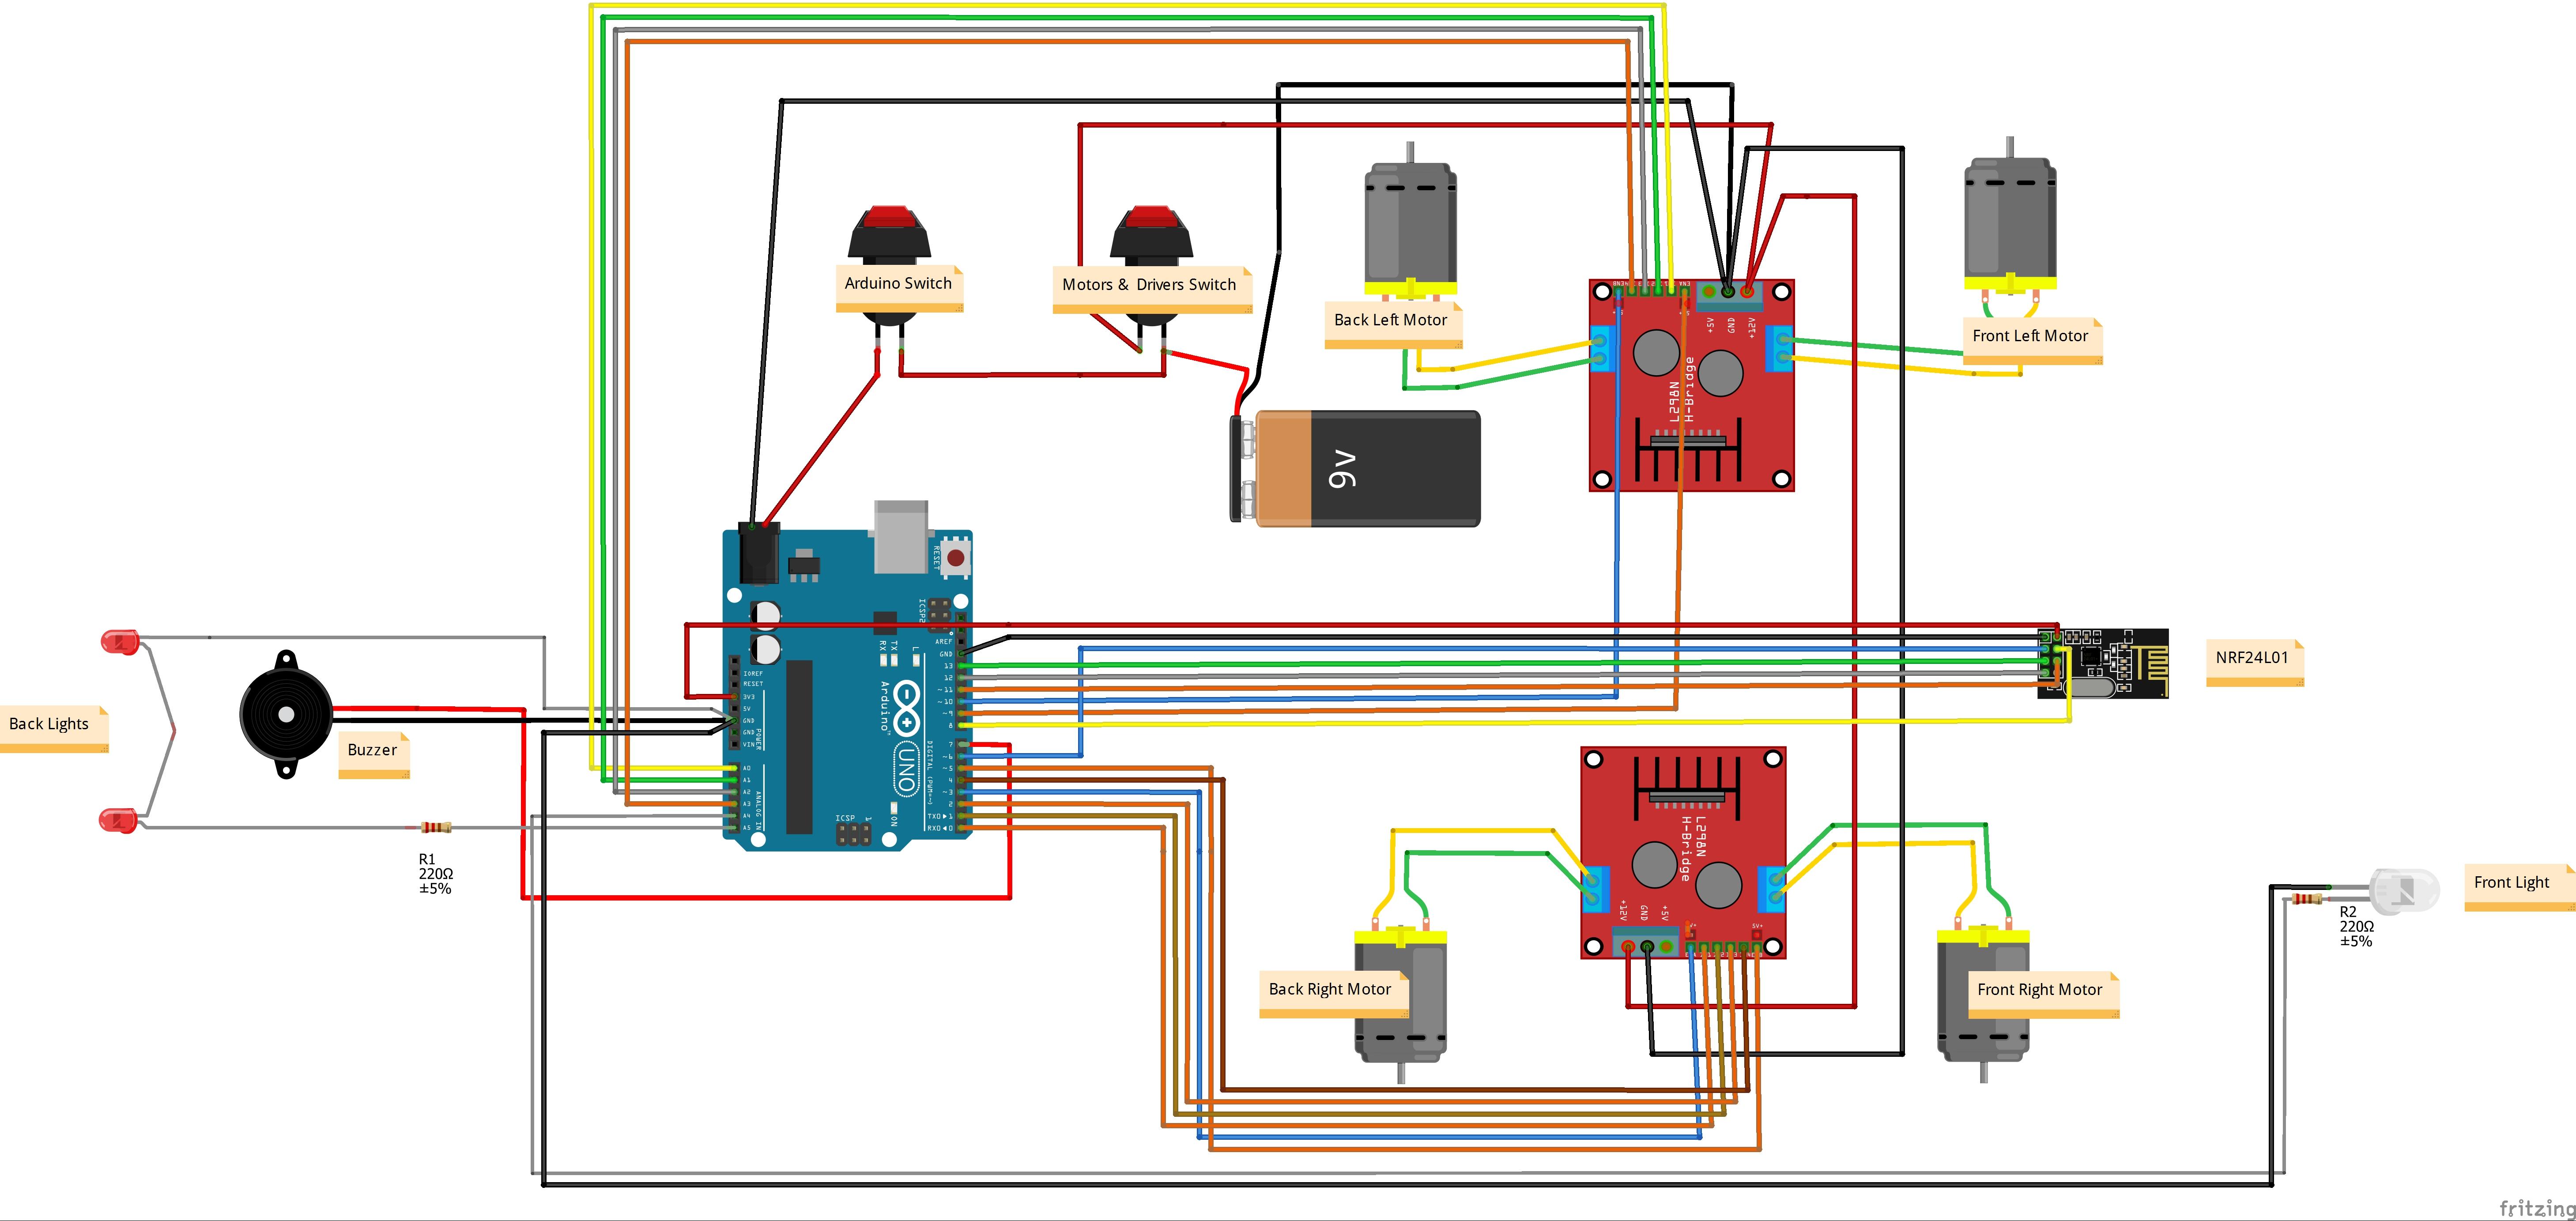 medium resolution of electric rc car wiring diagram wiring diagram for you electric vehicle charger wiring diagram electric rc car wiring diagram